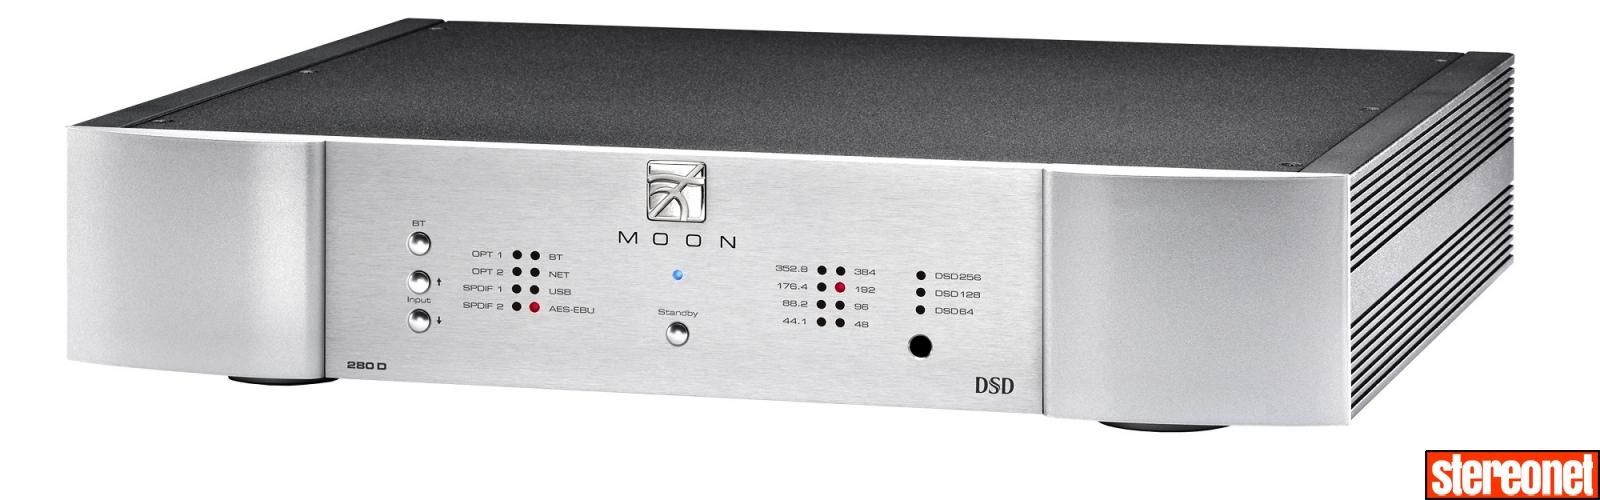 MOON 280D Review